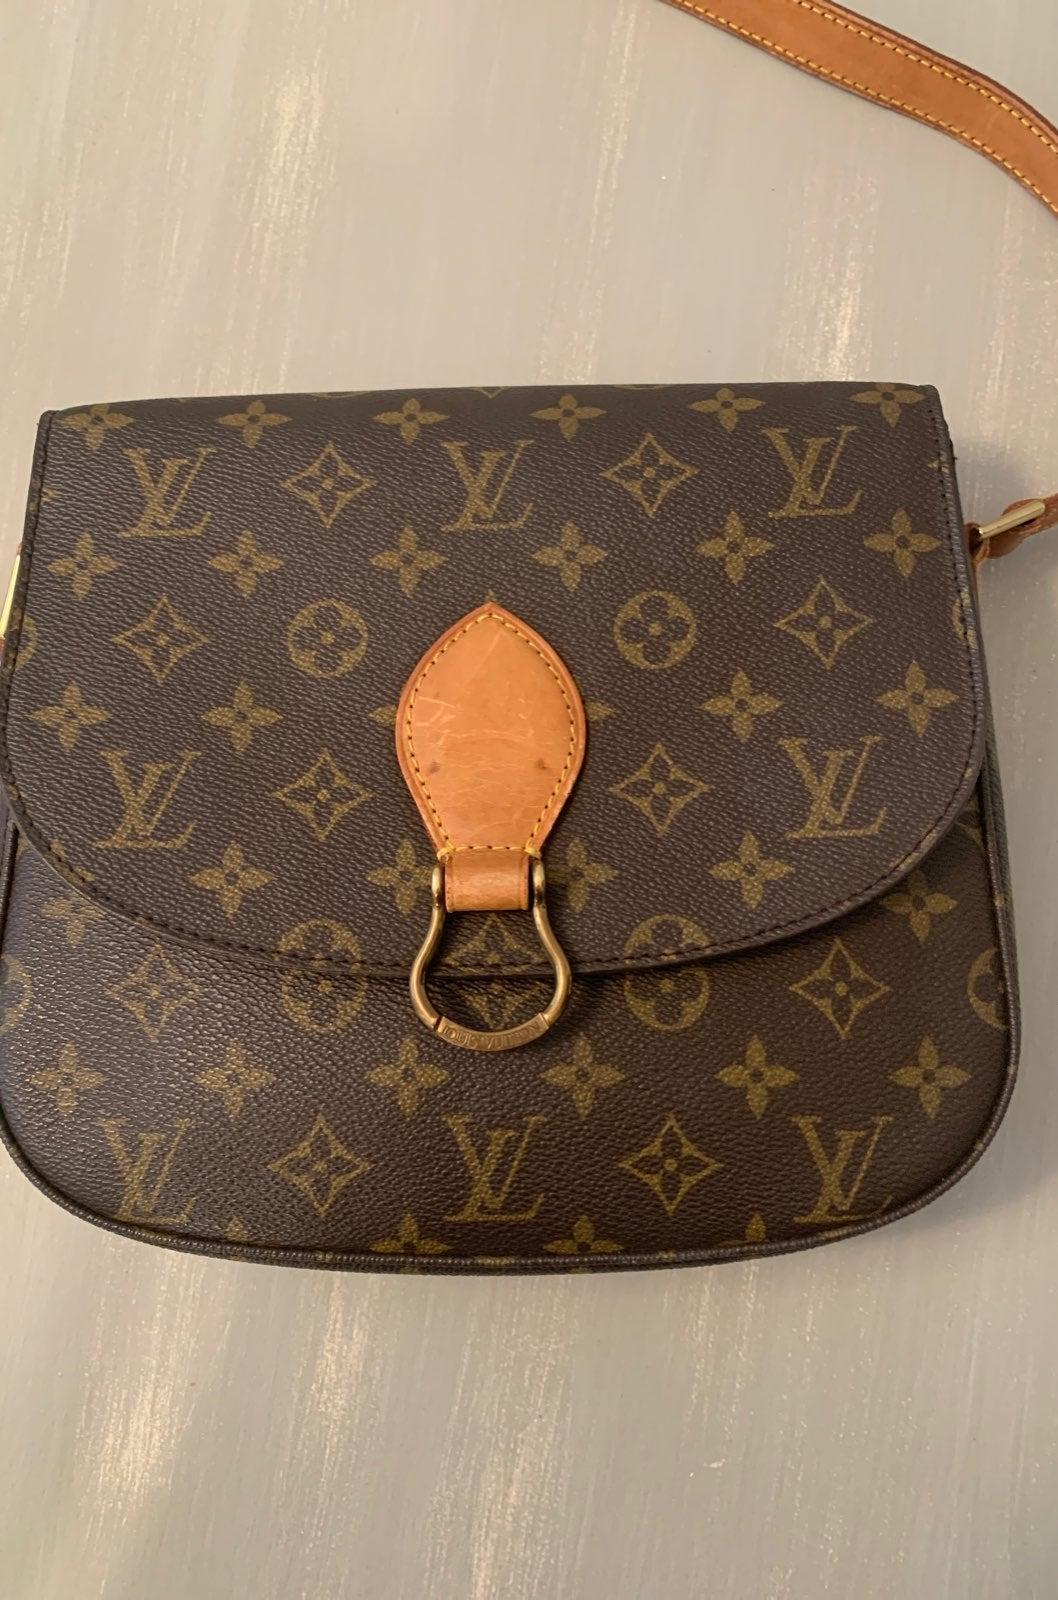 Louis Vuitton Saint Cloud GM crossbody